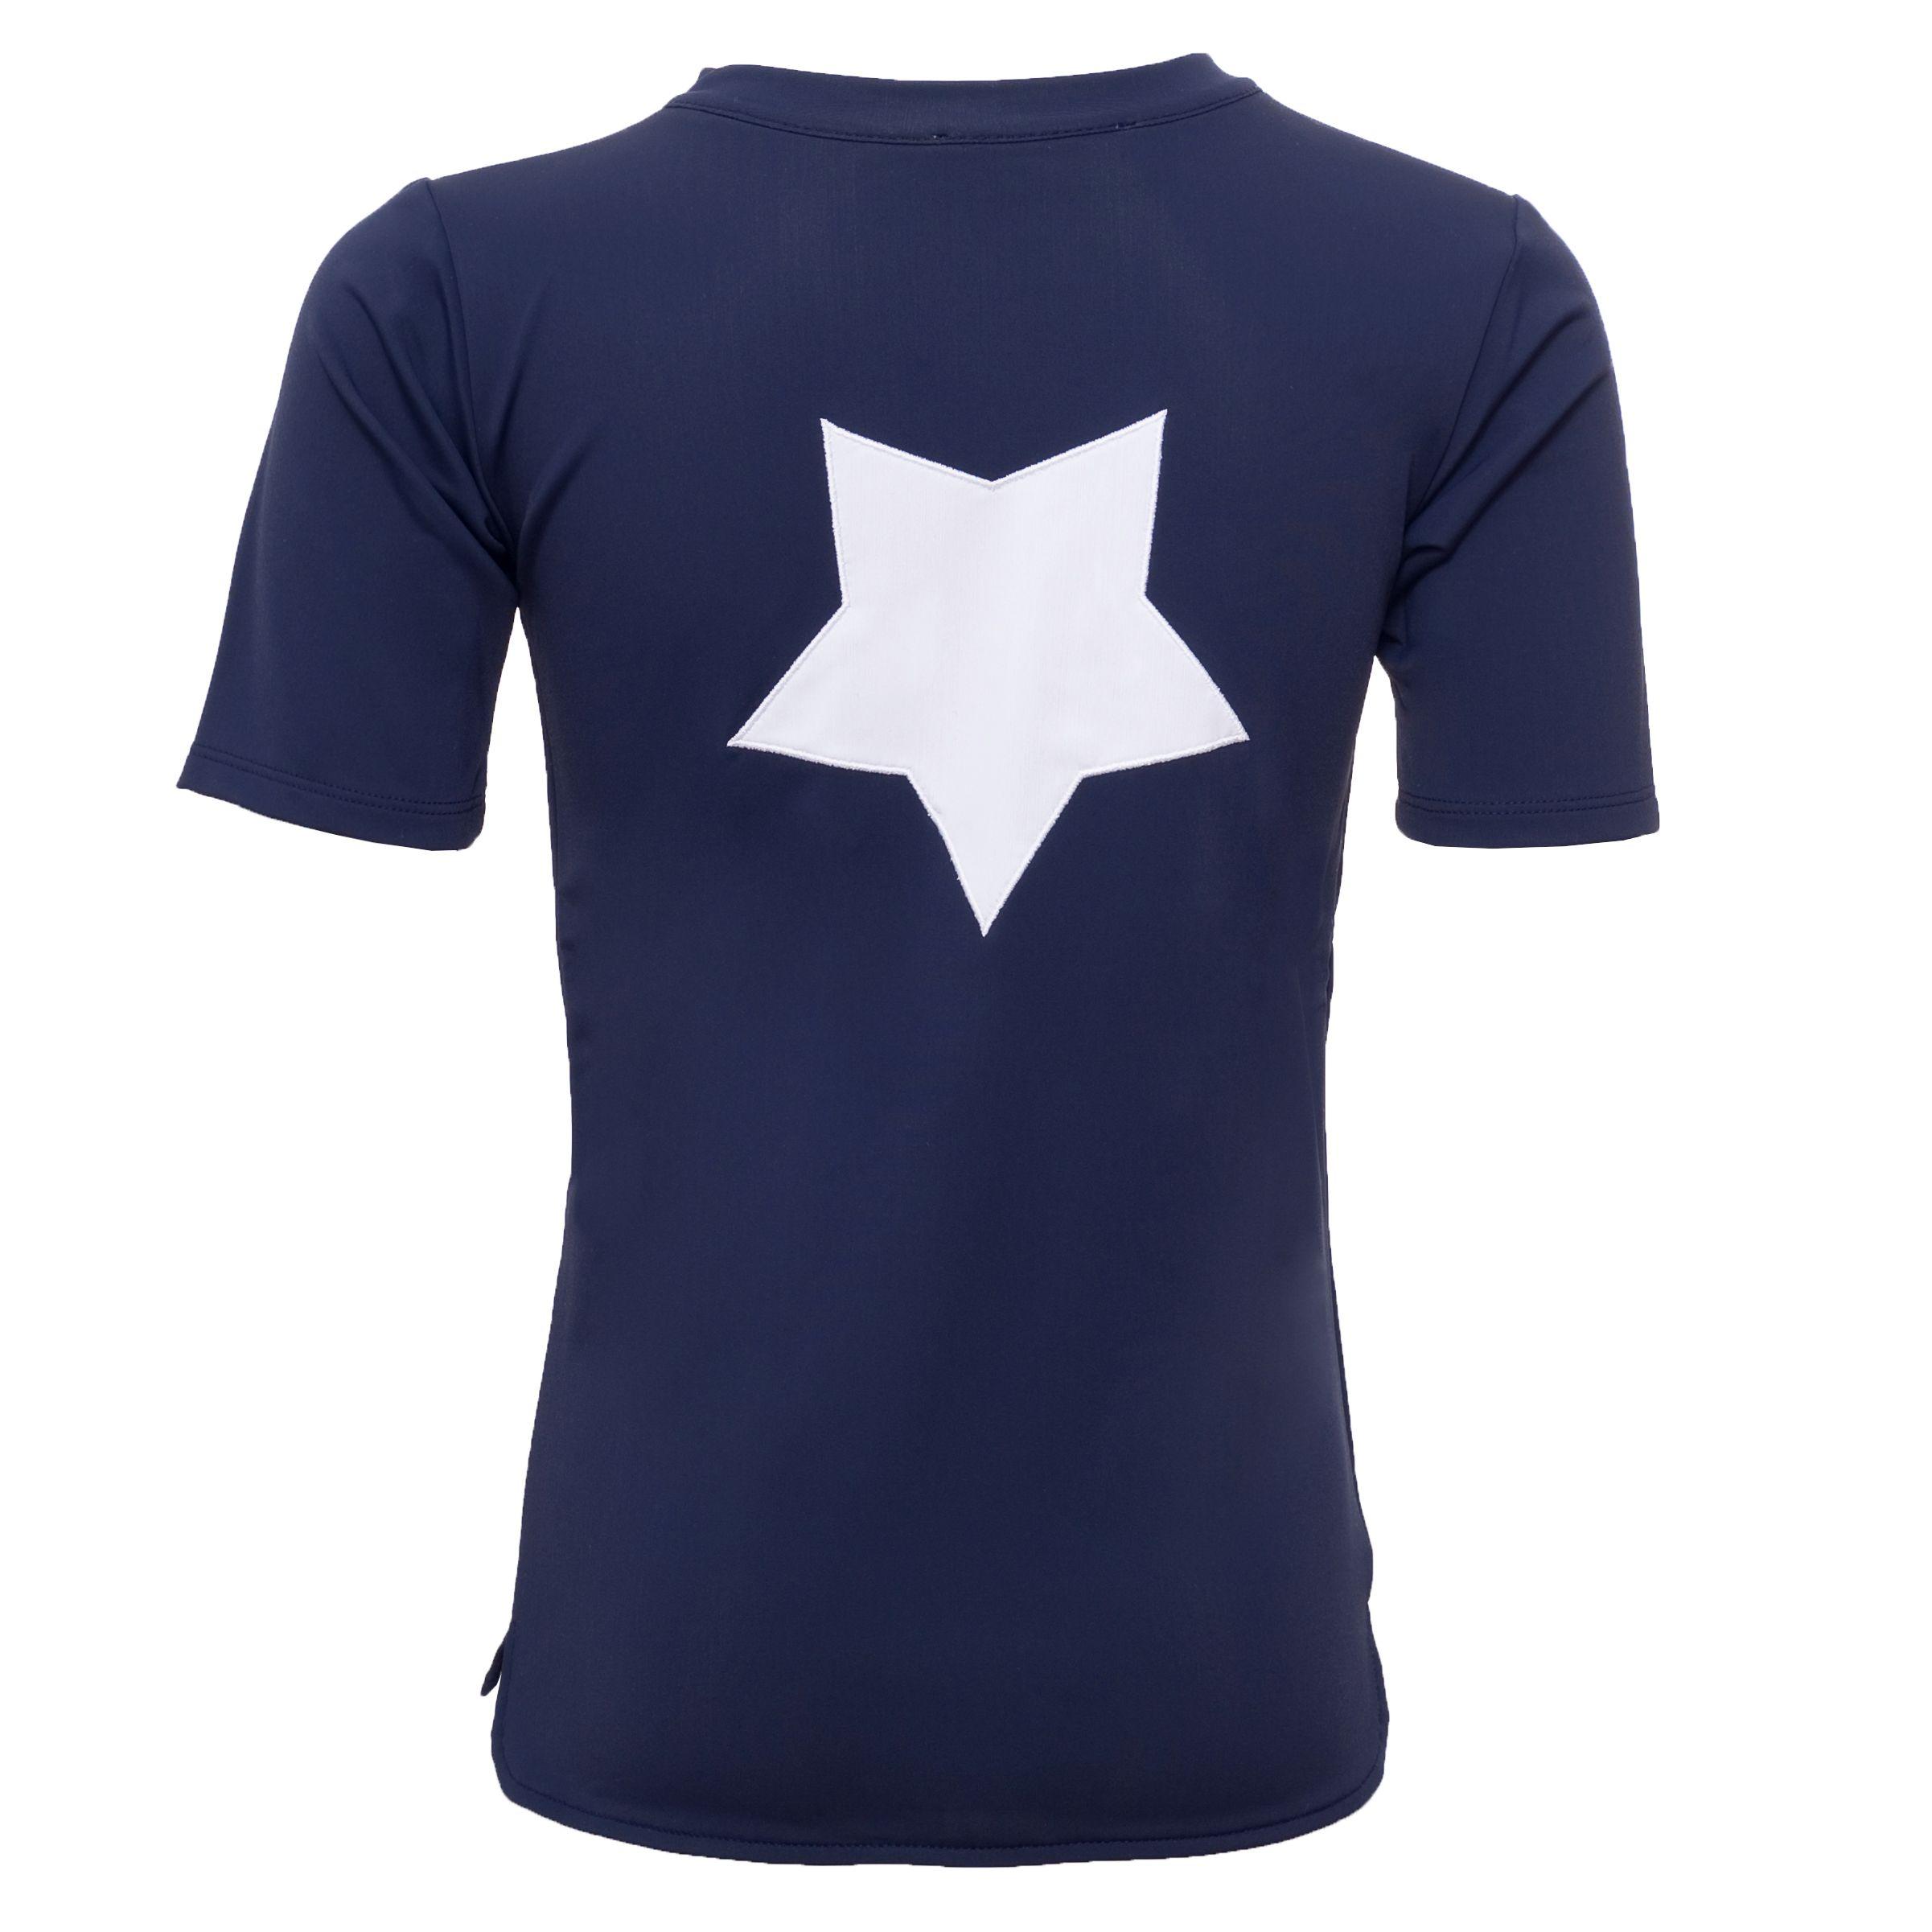 Bluse fra Petit Crabe - K/Æ - UV50 - Star - Blue